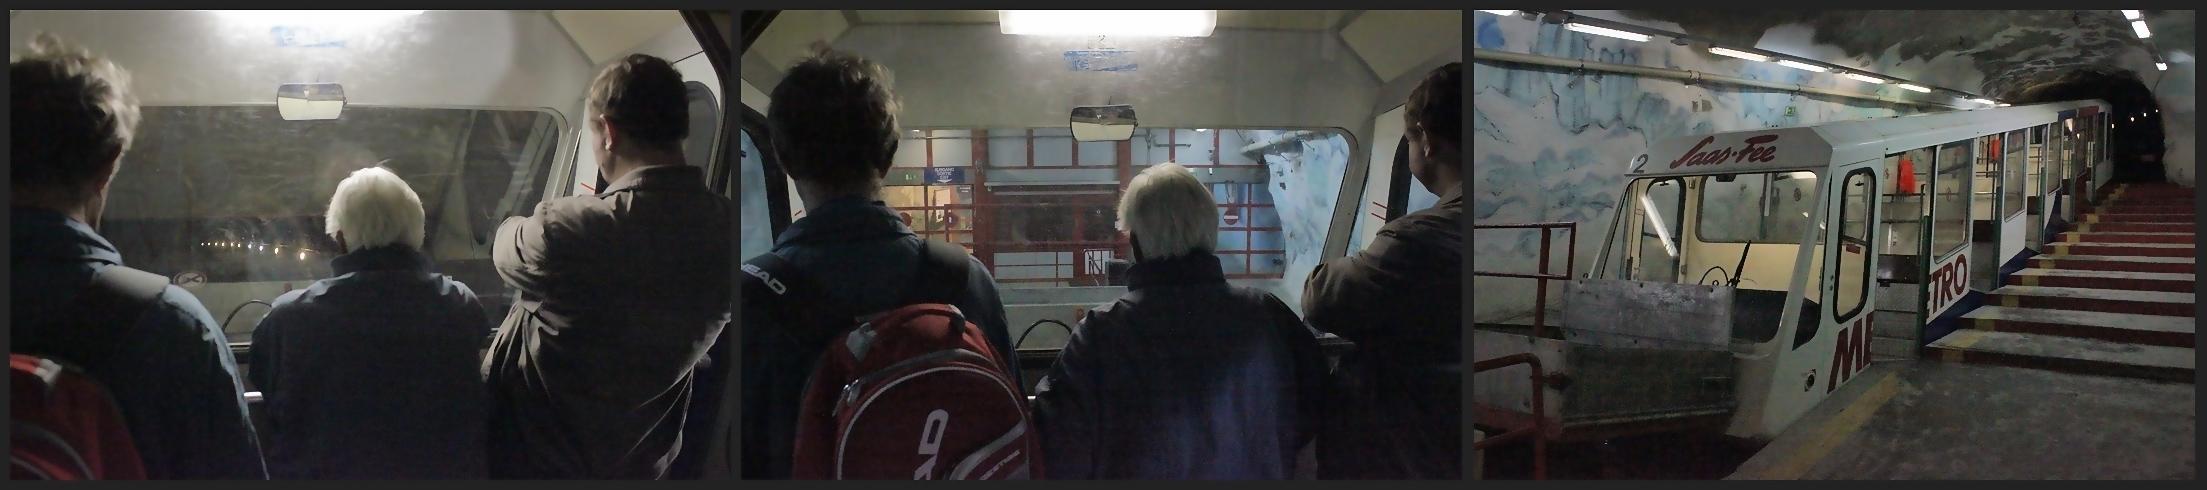 Metro-Alpin